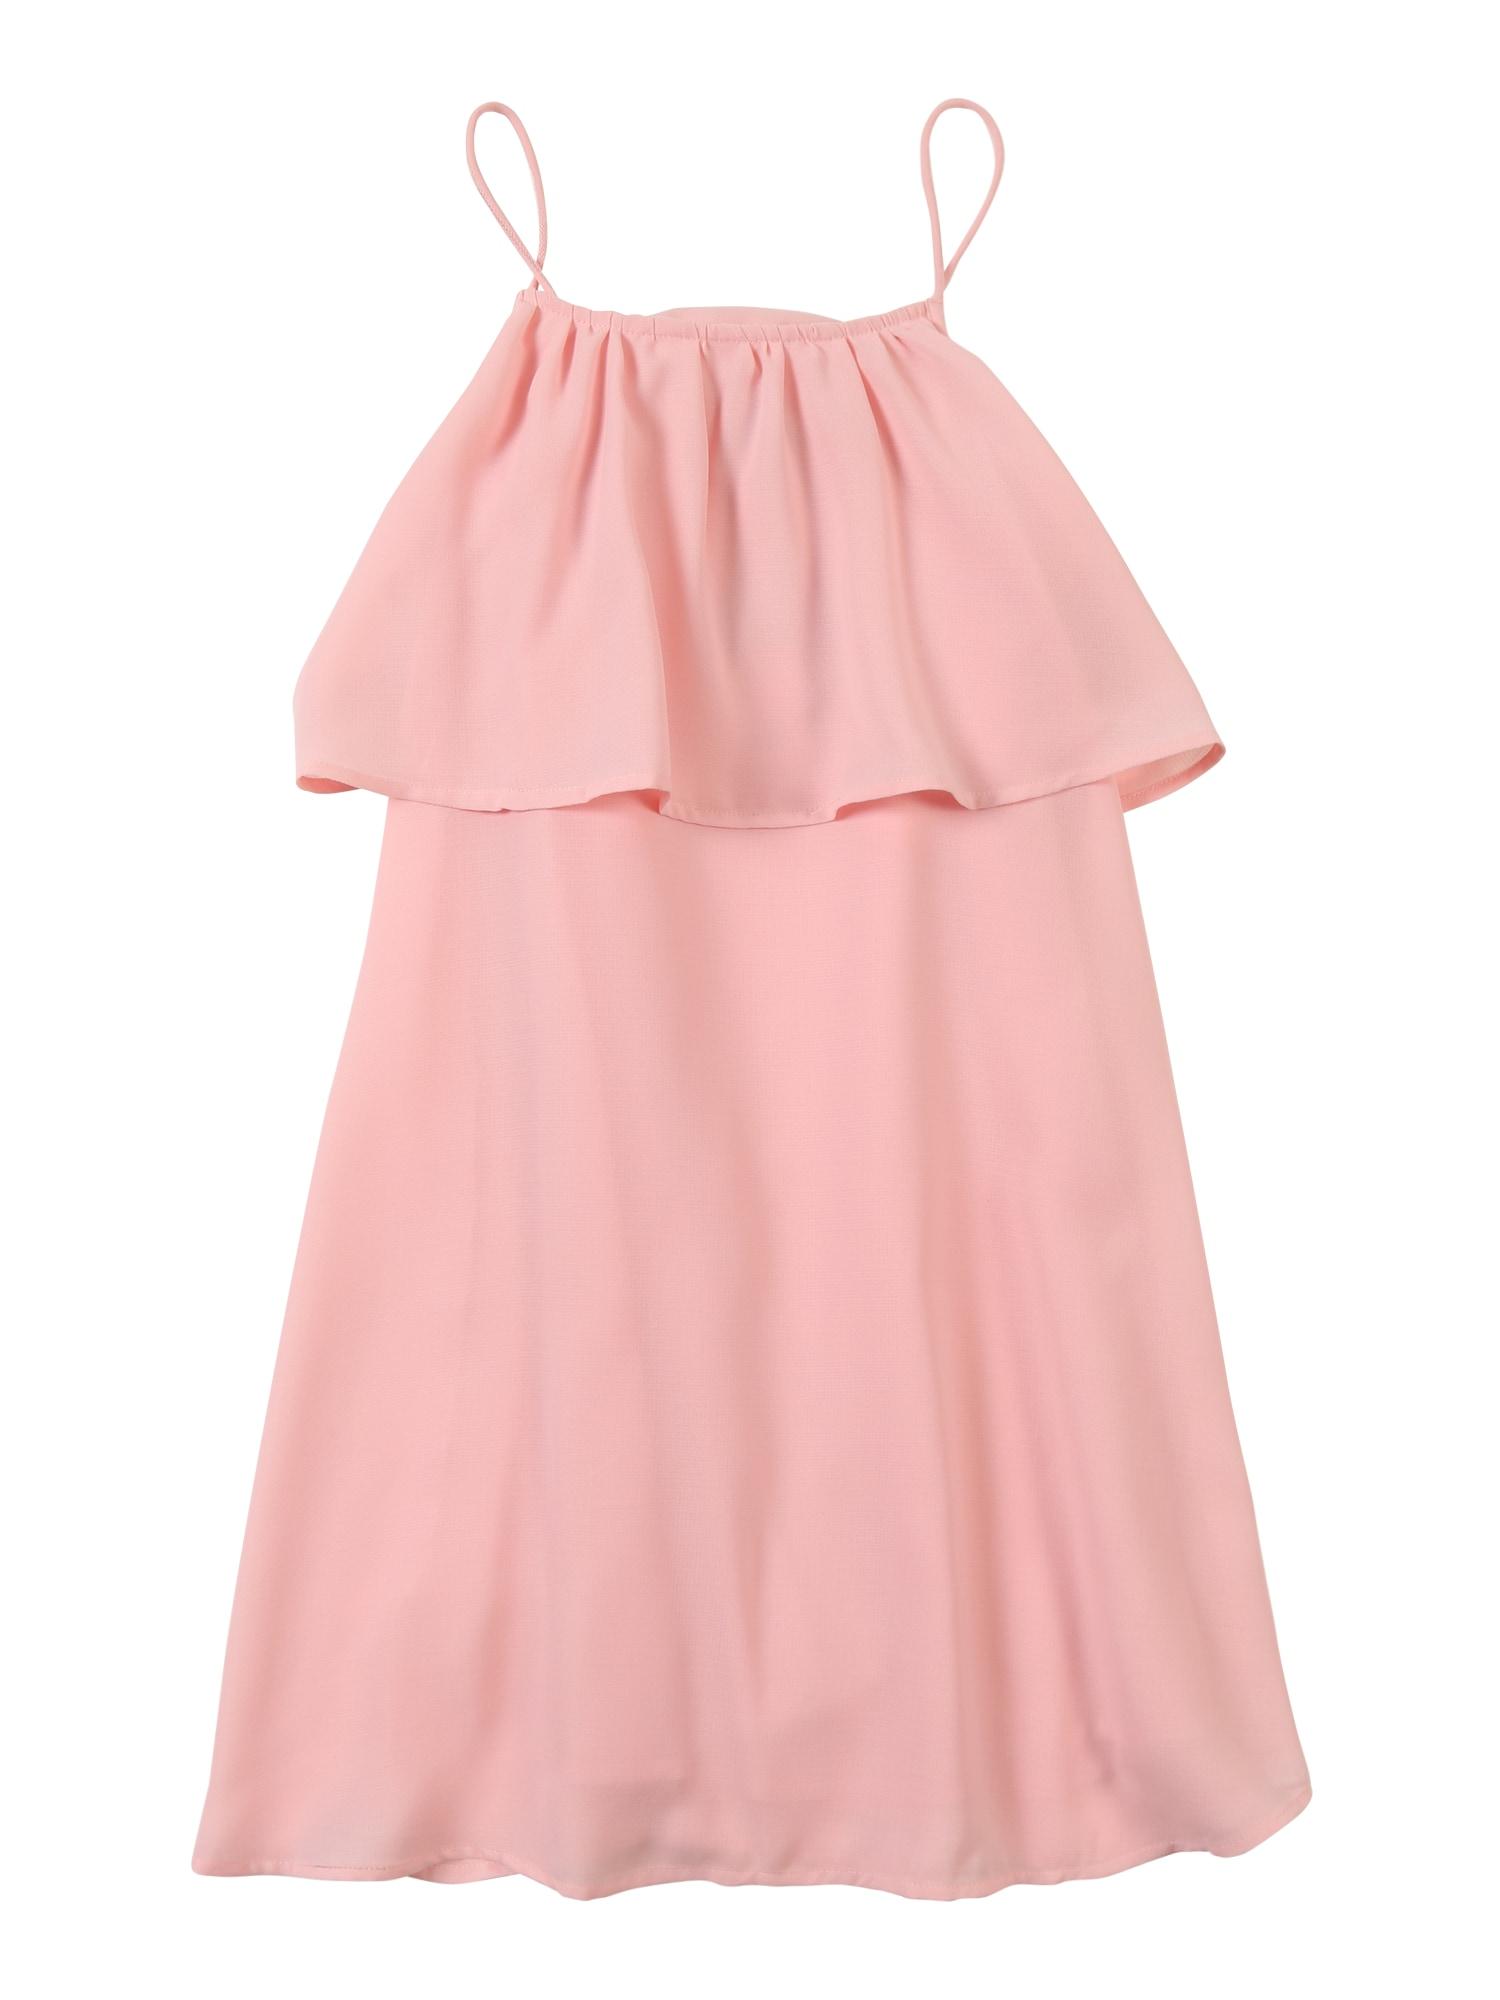 Šaty TG-19-KL203 růžová REVIEW FOR TEENS